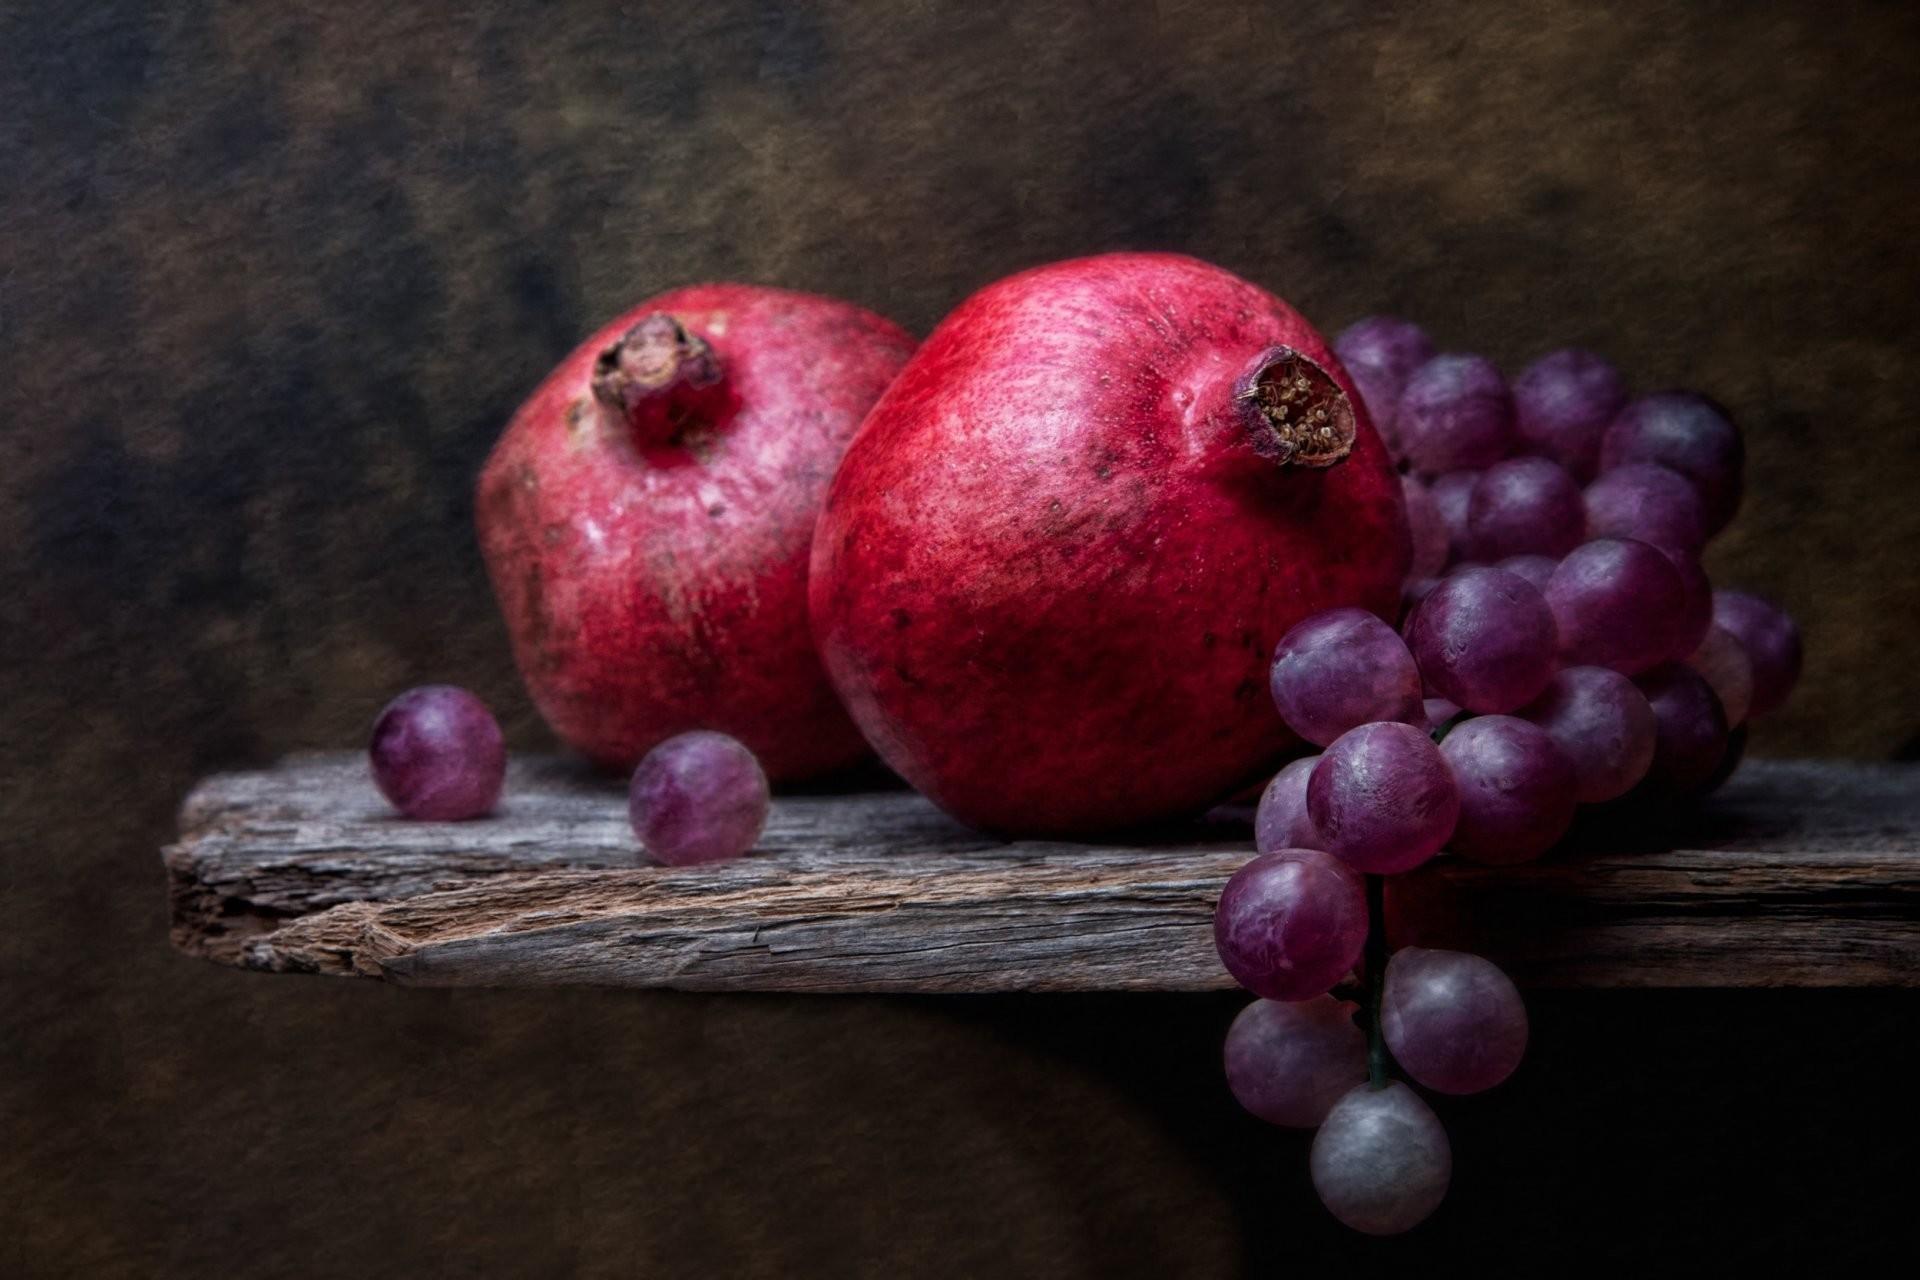 grapes and pomegranates grapes grenade still life